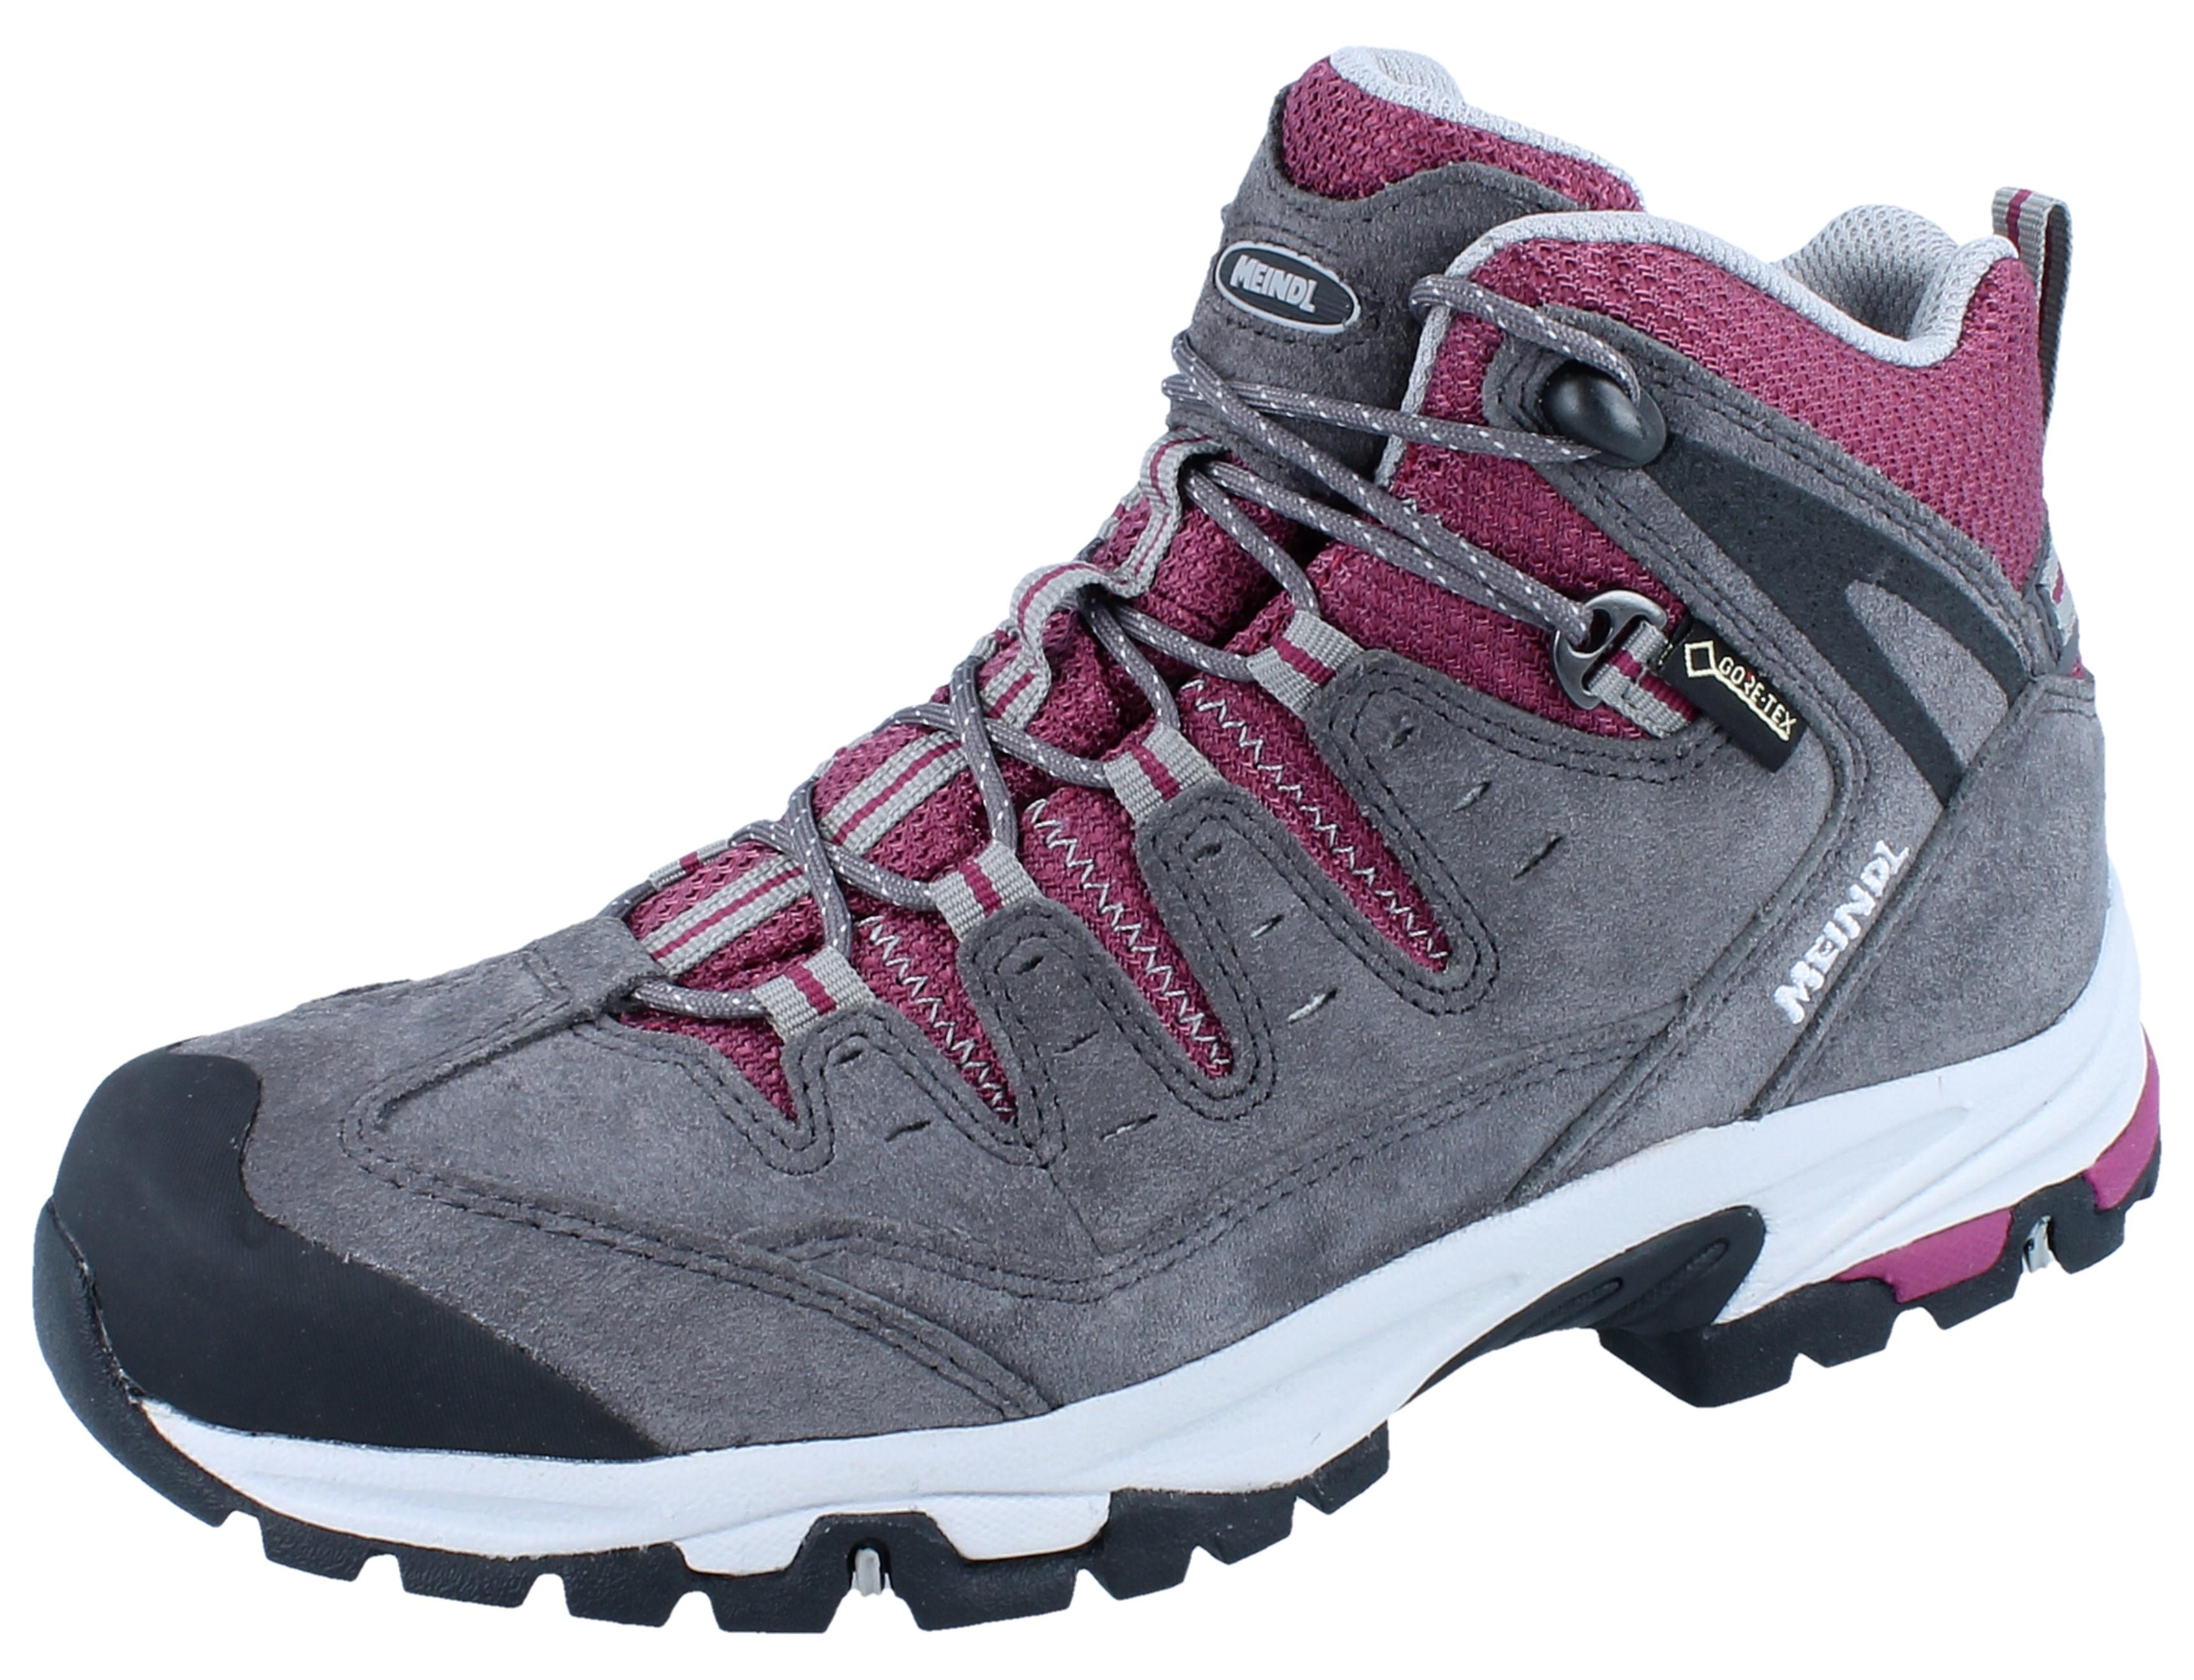 Meindl Damen Schuhe Tereno Lady GTX® violett Veloursleder NEU